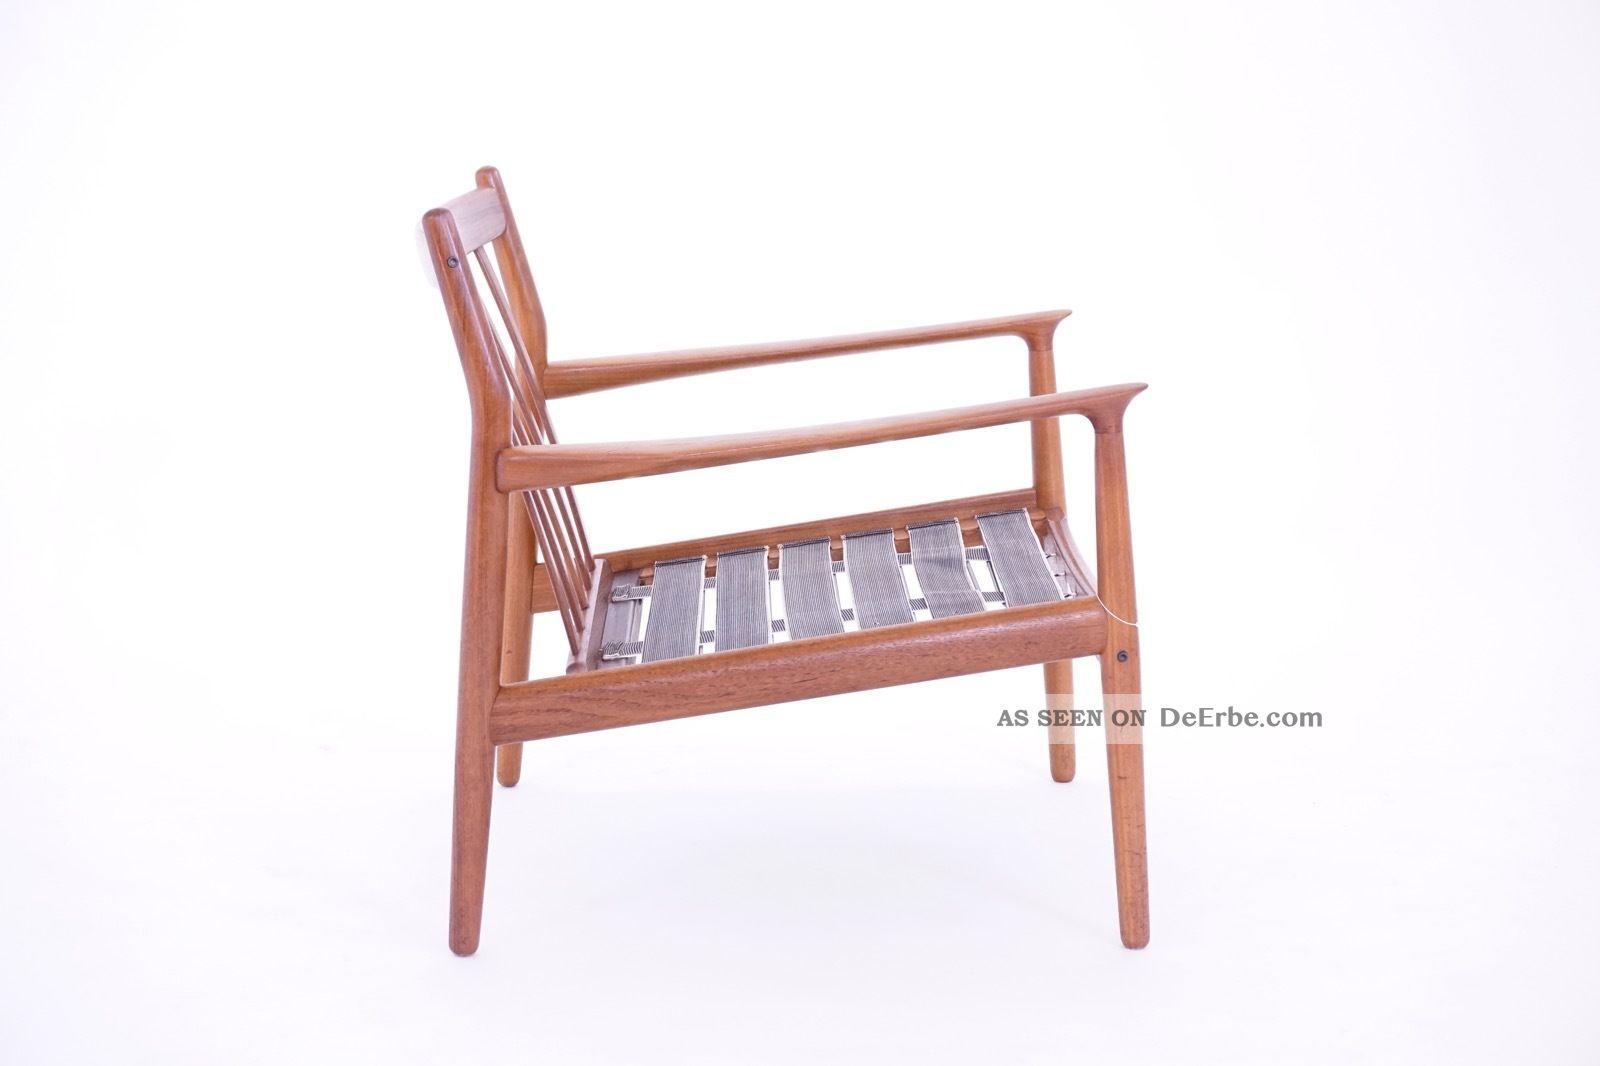 60s Grete Jalk Mid Century Modern Teak Sessel 60er Easy Chair Glostrup DÄnemark 1960-1969 Bild